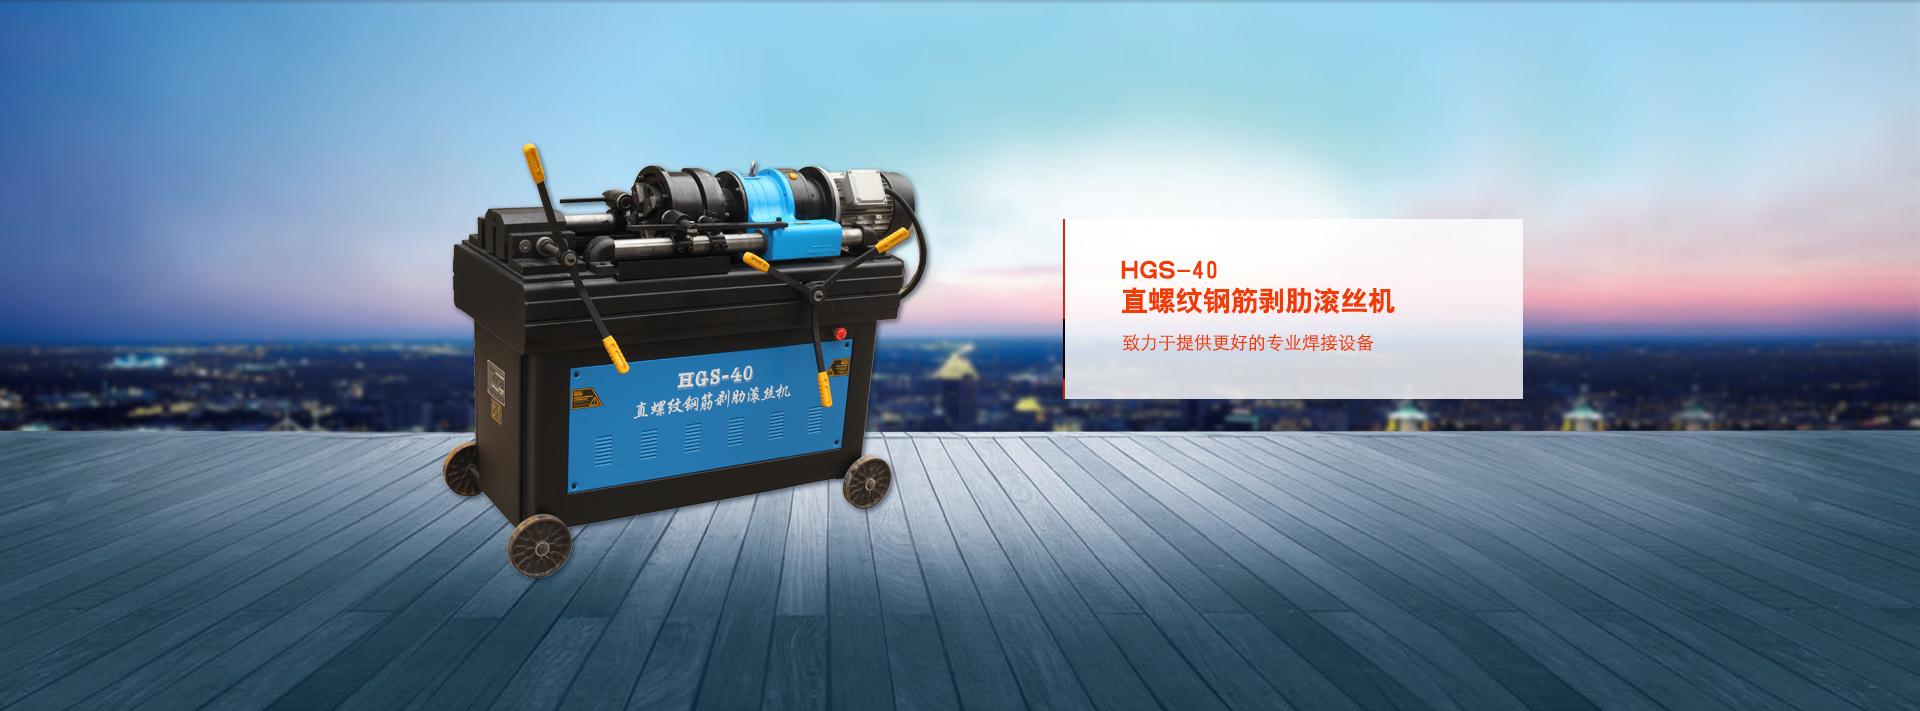 HGS-40直螺紋鋼筋剝肋滾絲機